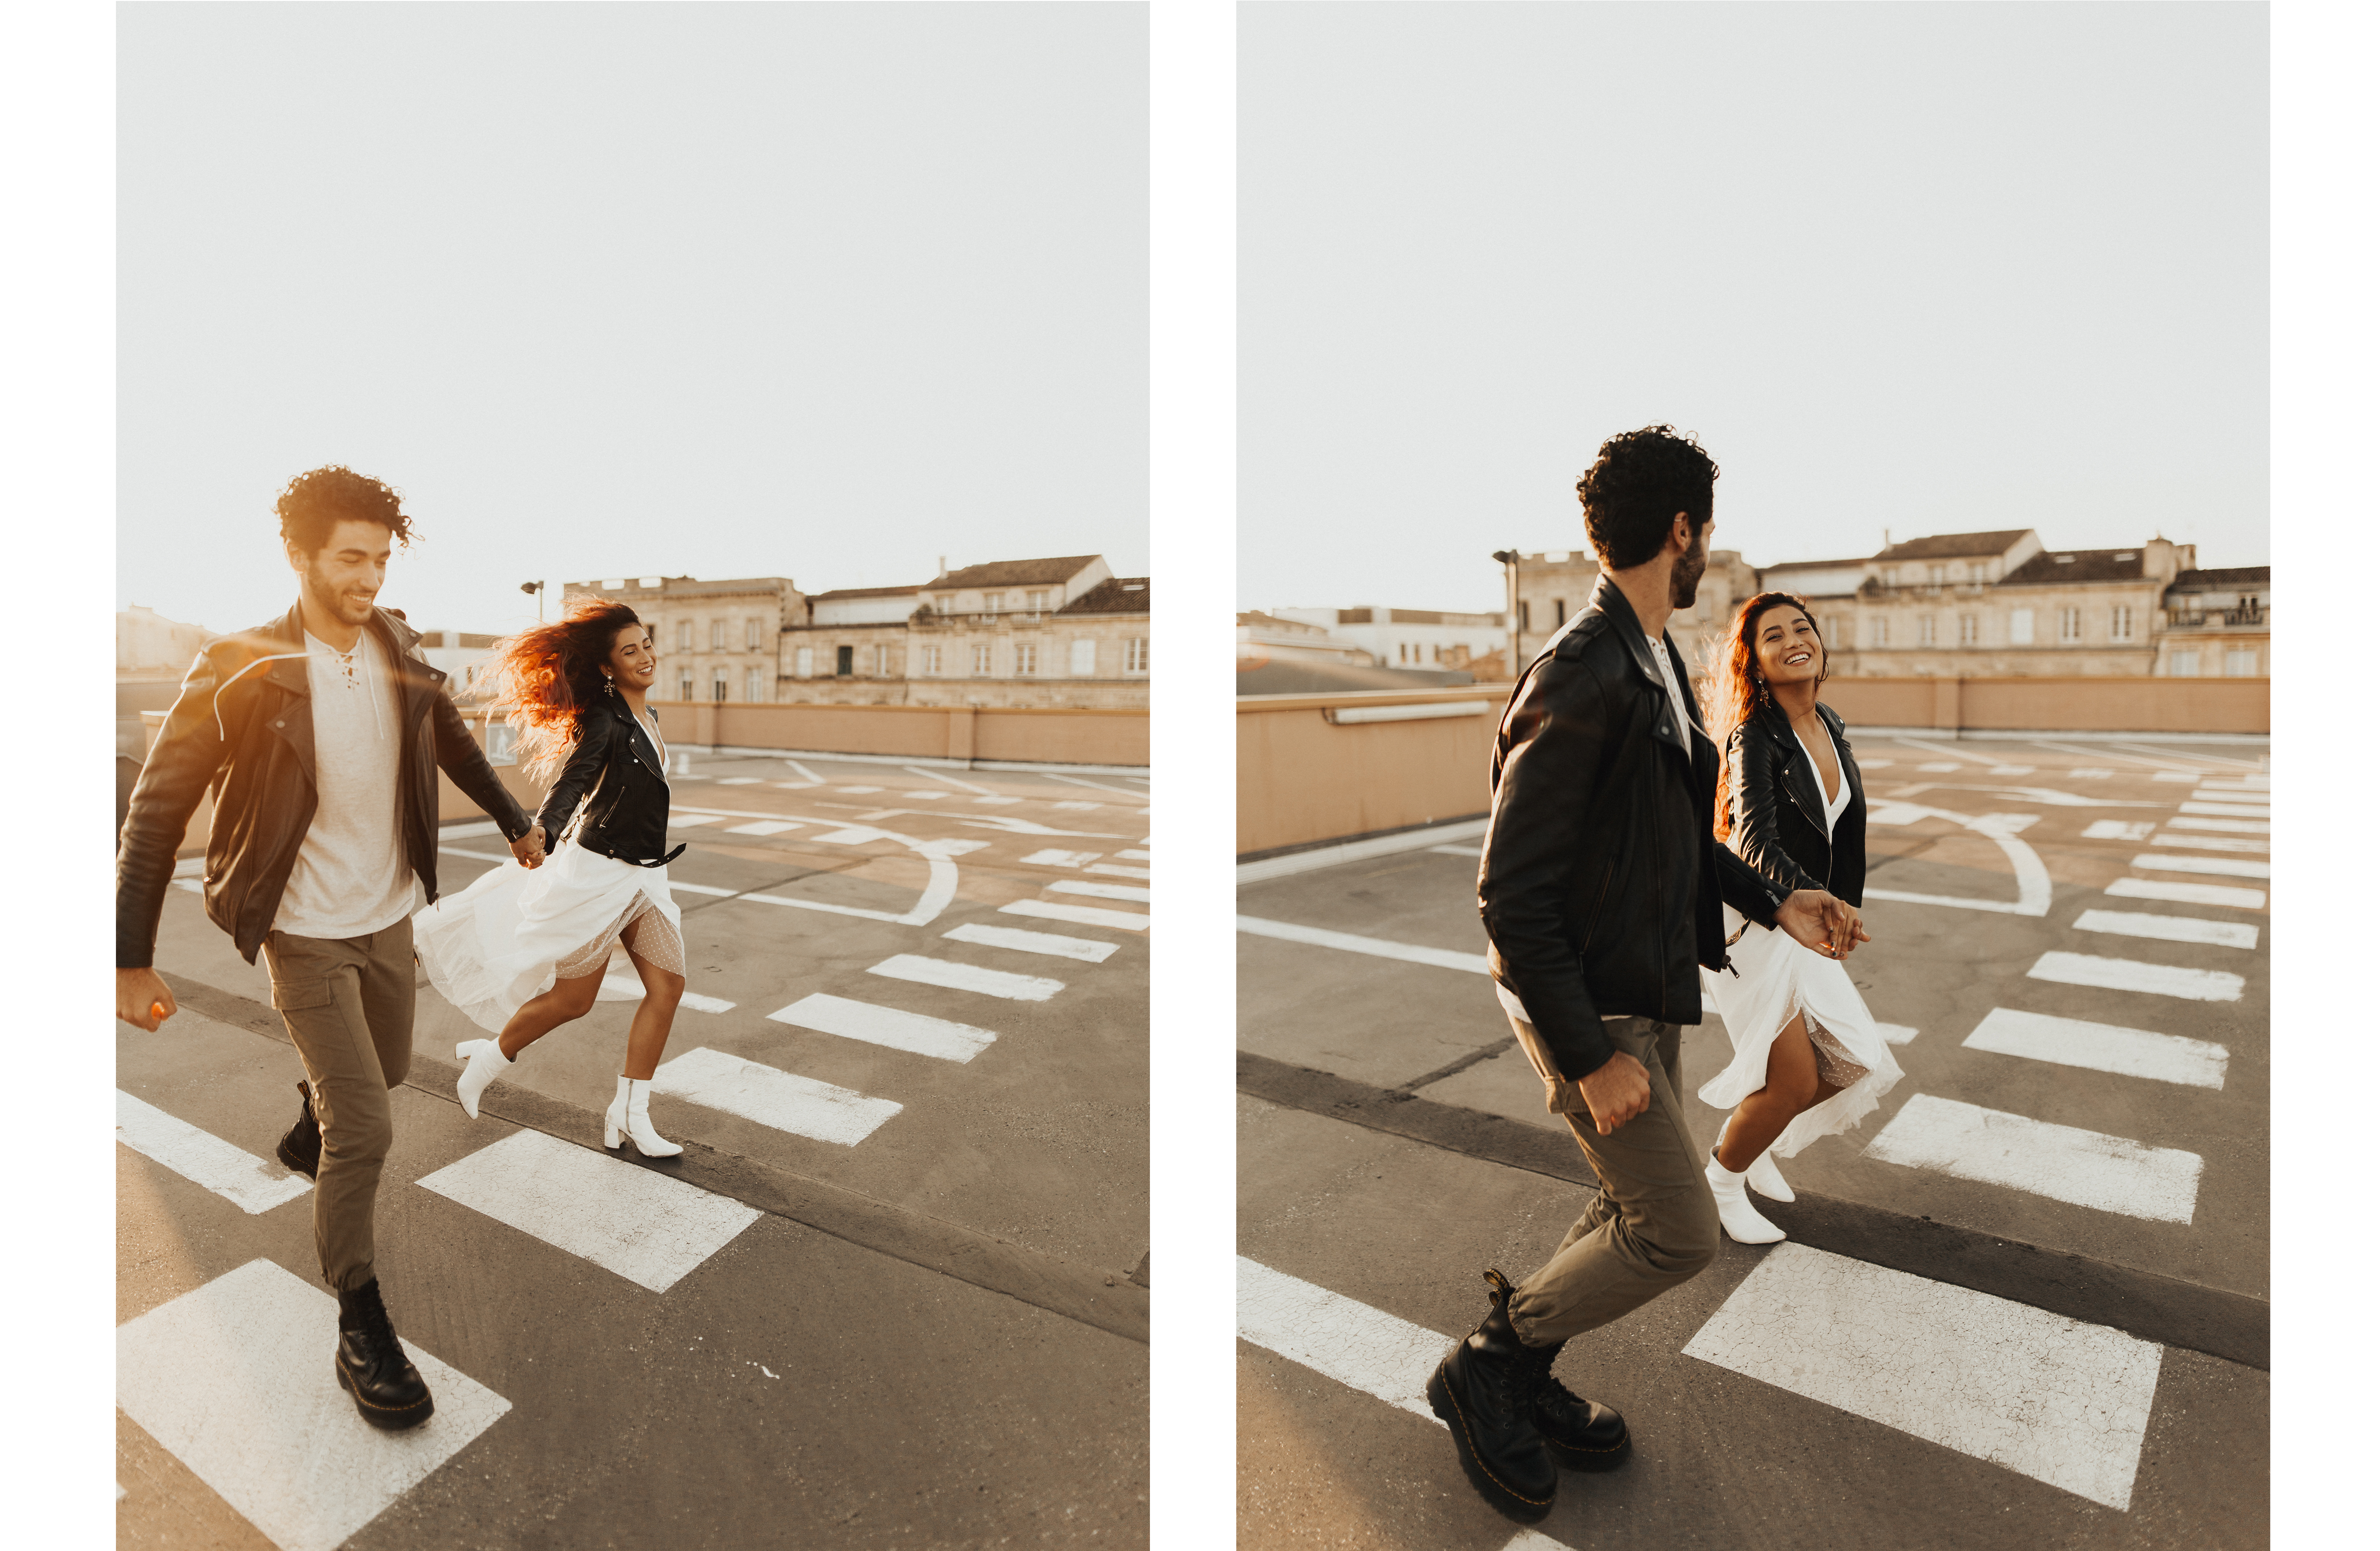 Ghania-iratni-photographe-mariage-couple-bordeaux